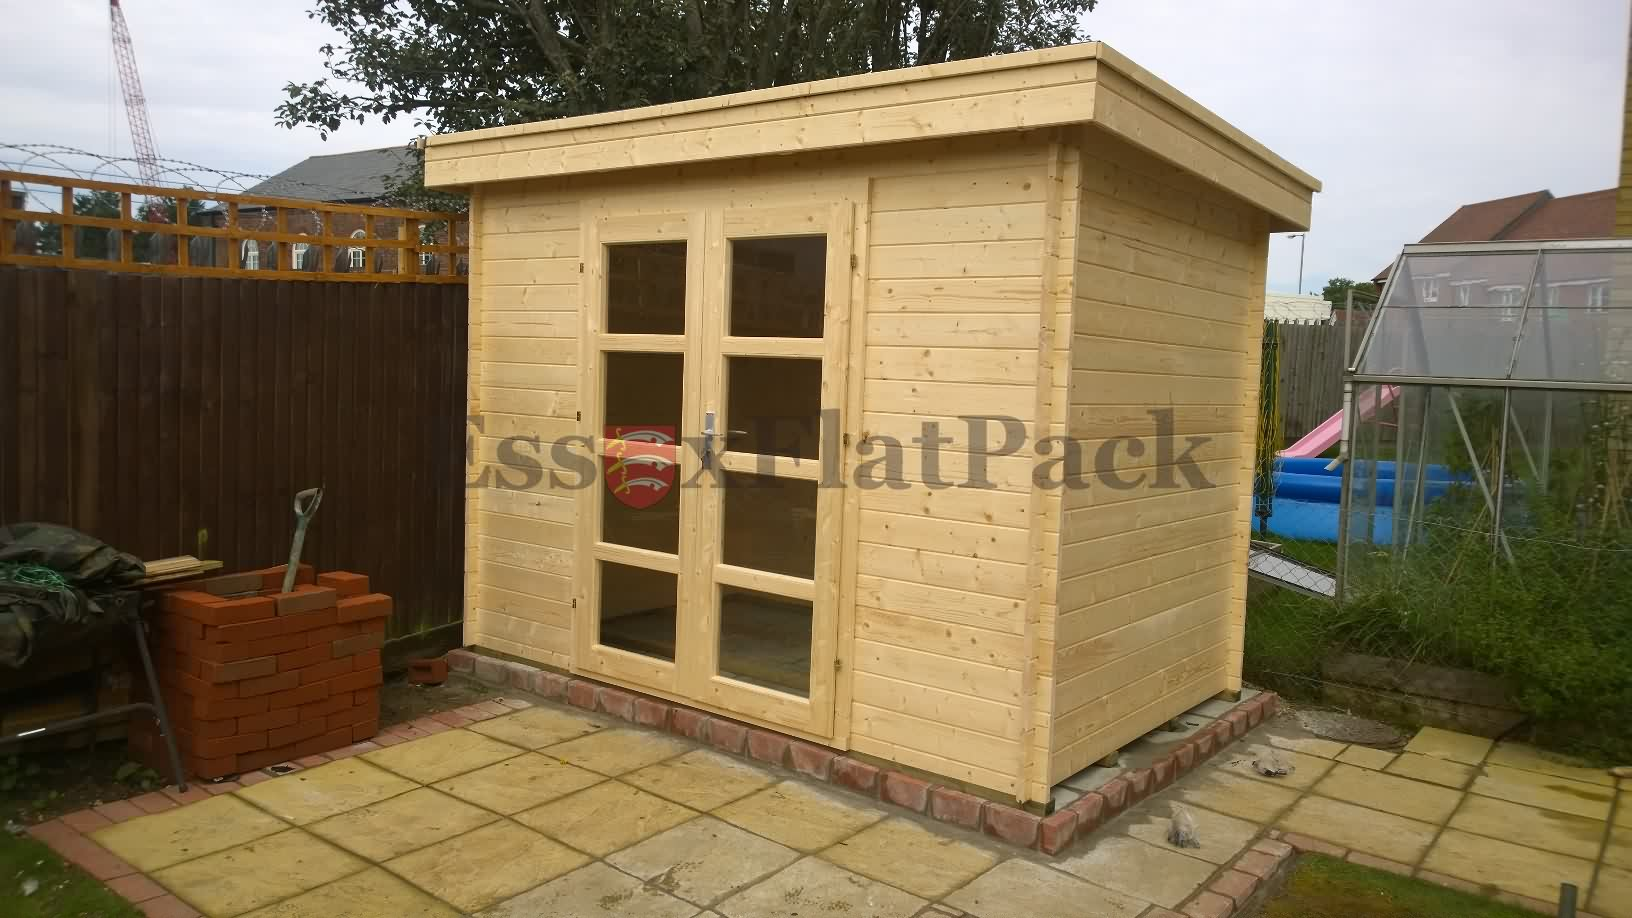 essexflatpack-log-cabins-20150917115511.jpg